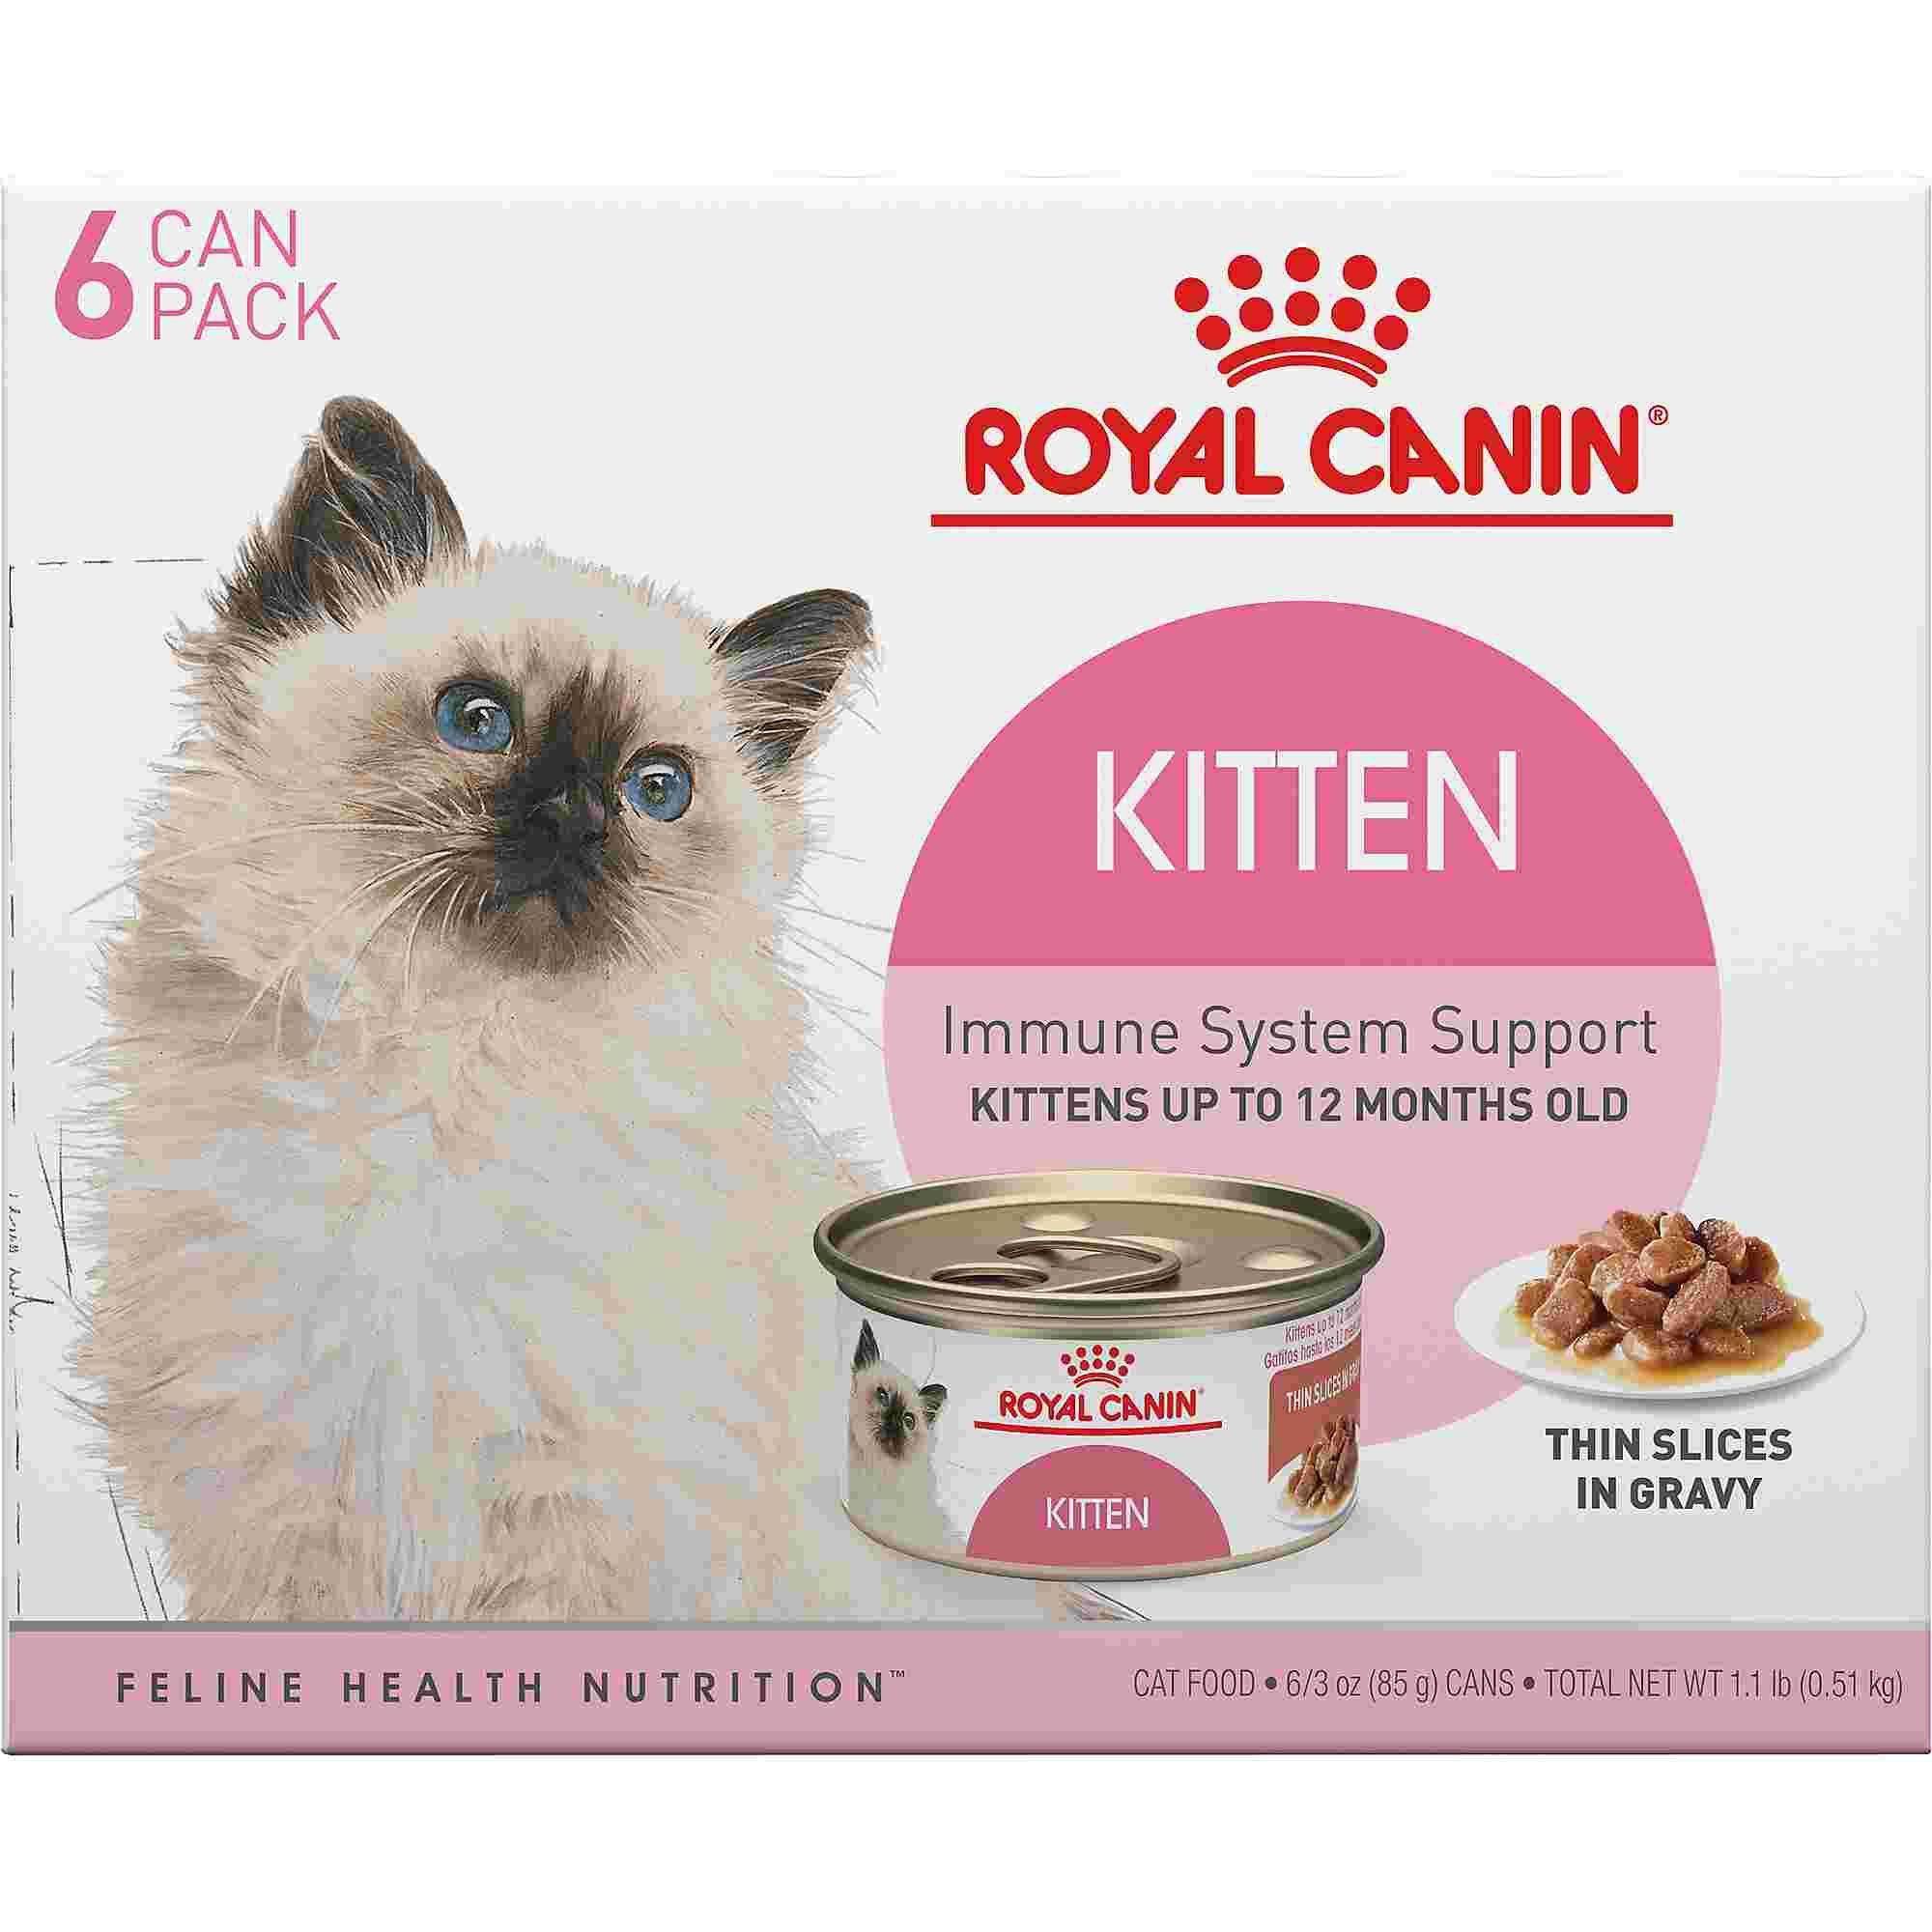 Royal Canin Feline Health Nutrition Thin Slices in Gravy